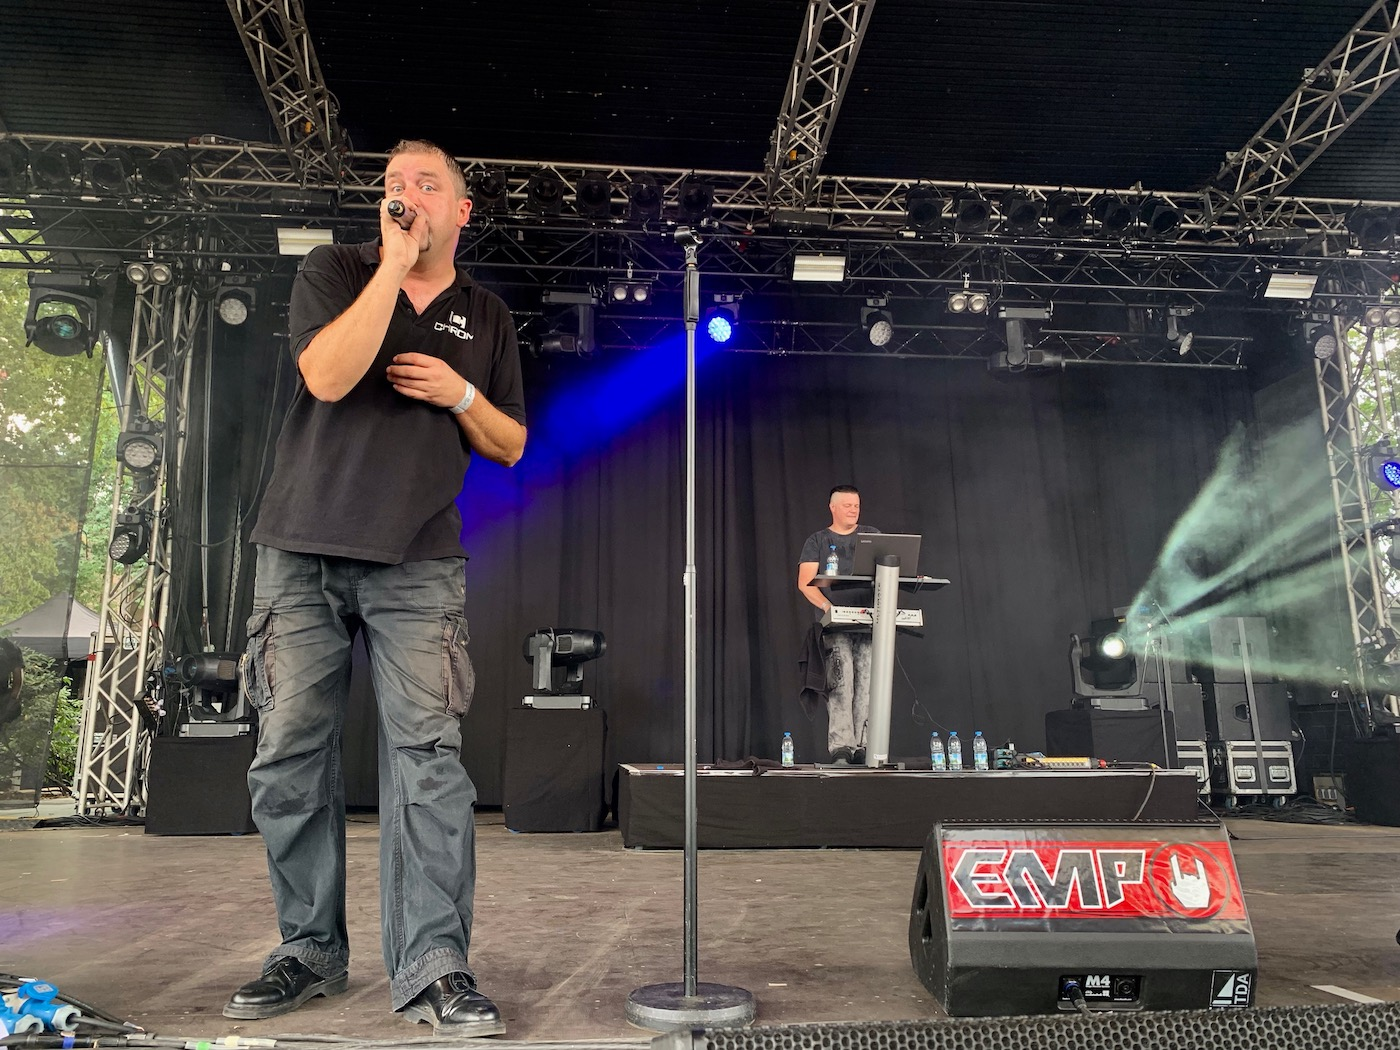 mark_benecke_amphi_festival_koeln_2019 - 28.jpg